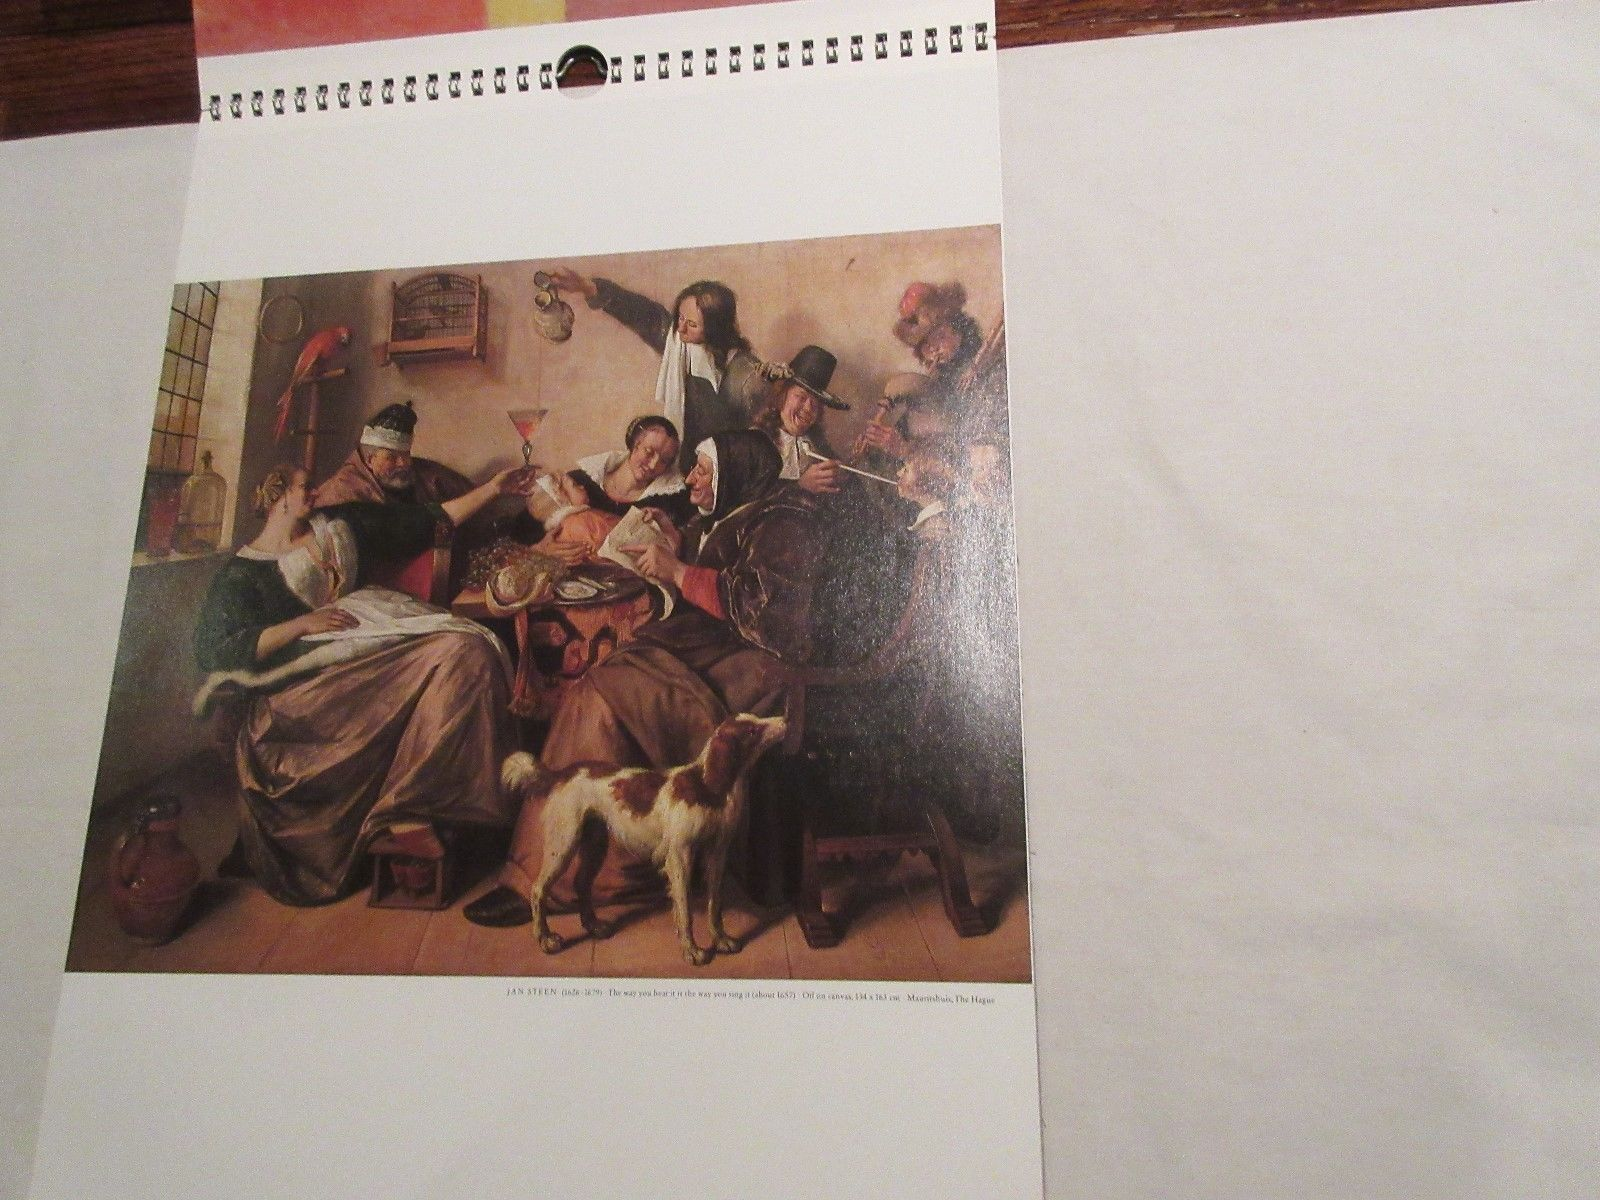 Rx , Pharmacy , Calendar , Hoechst-Roussel Pharmaceuticals Inc.,1987 , Vintage image 6